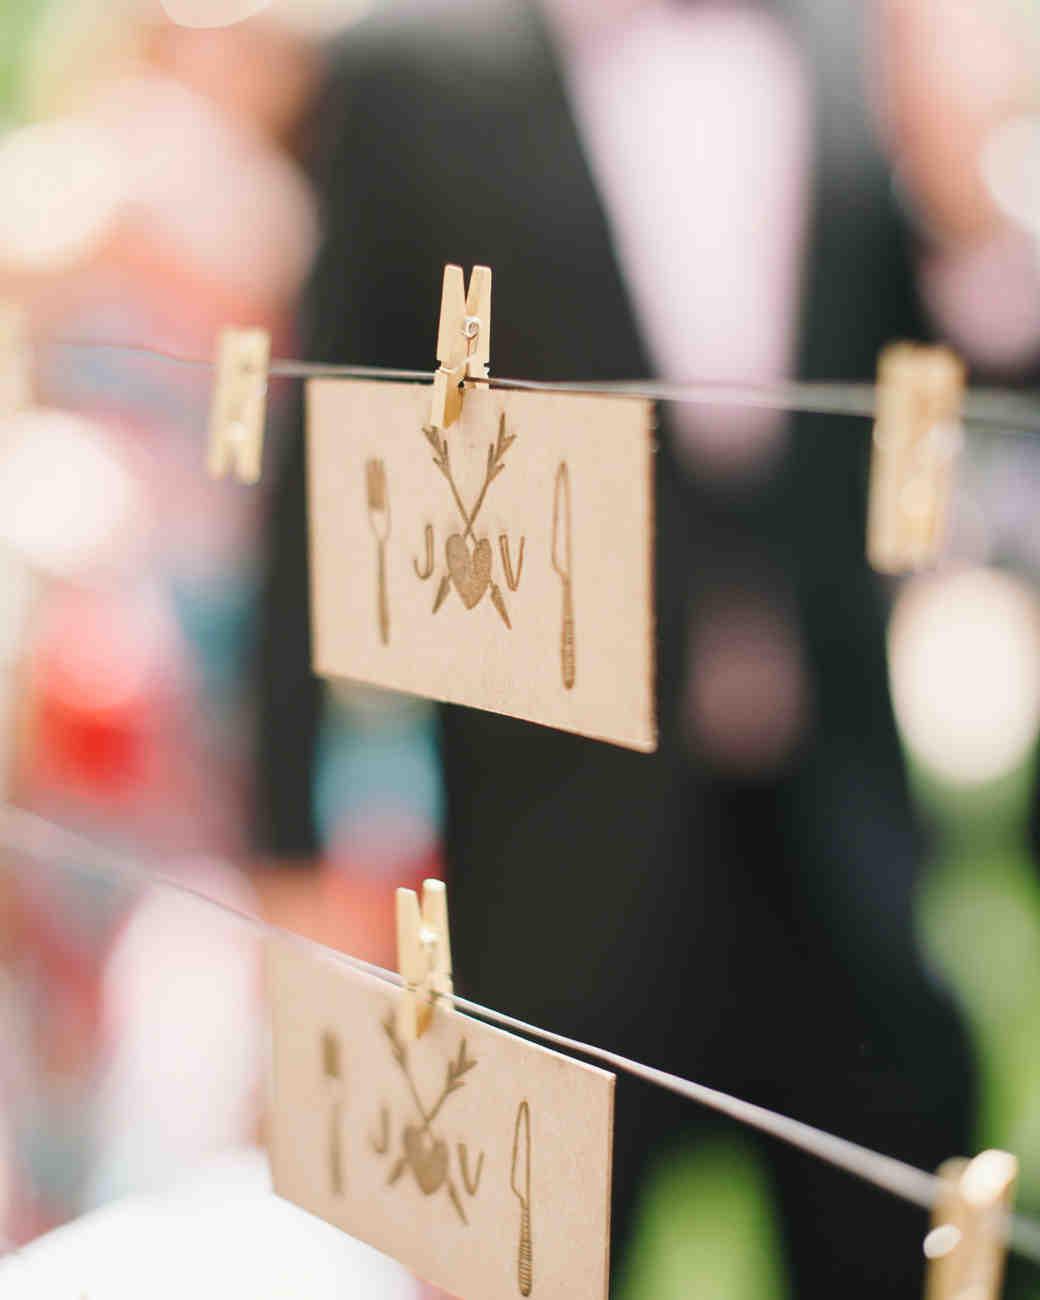 vanessa-joe-wedding-escortcards-11561-s111736-1214.jpg